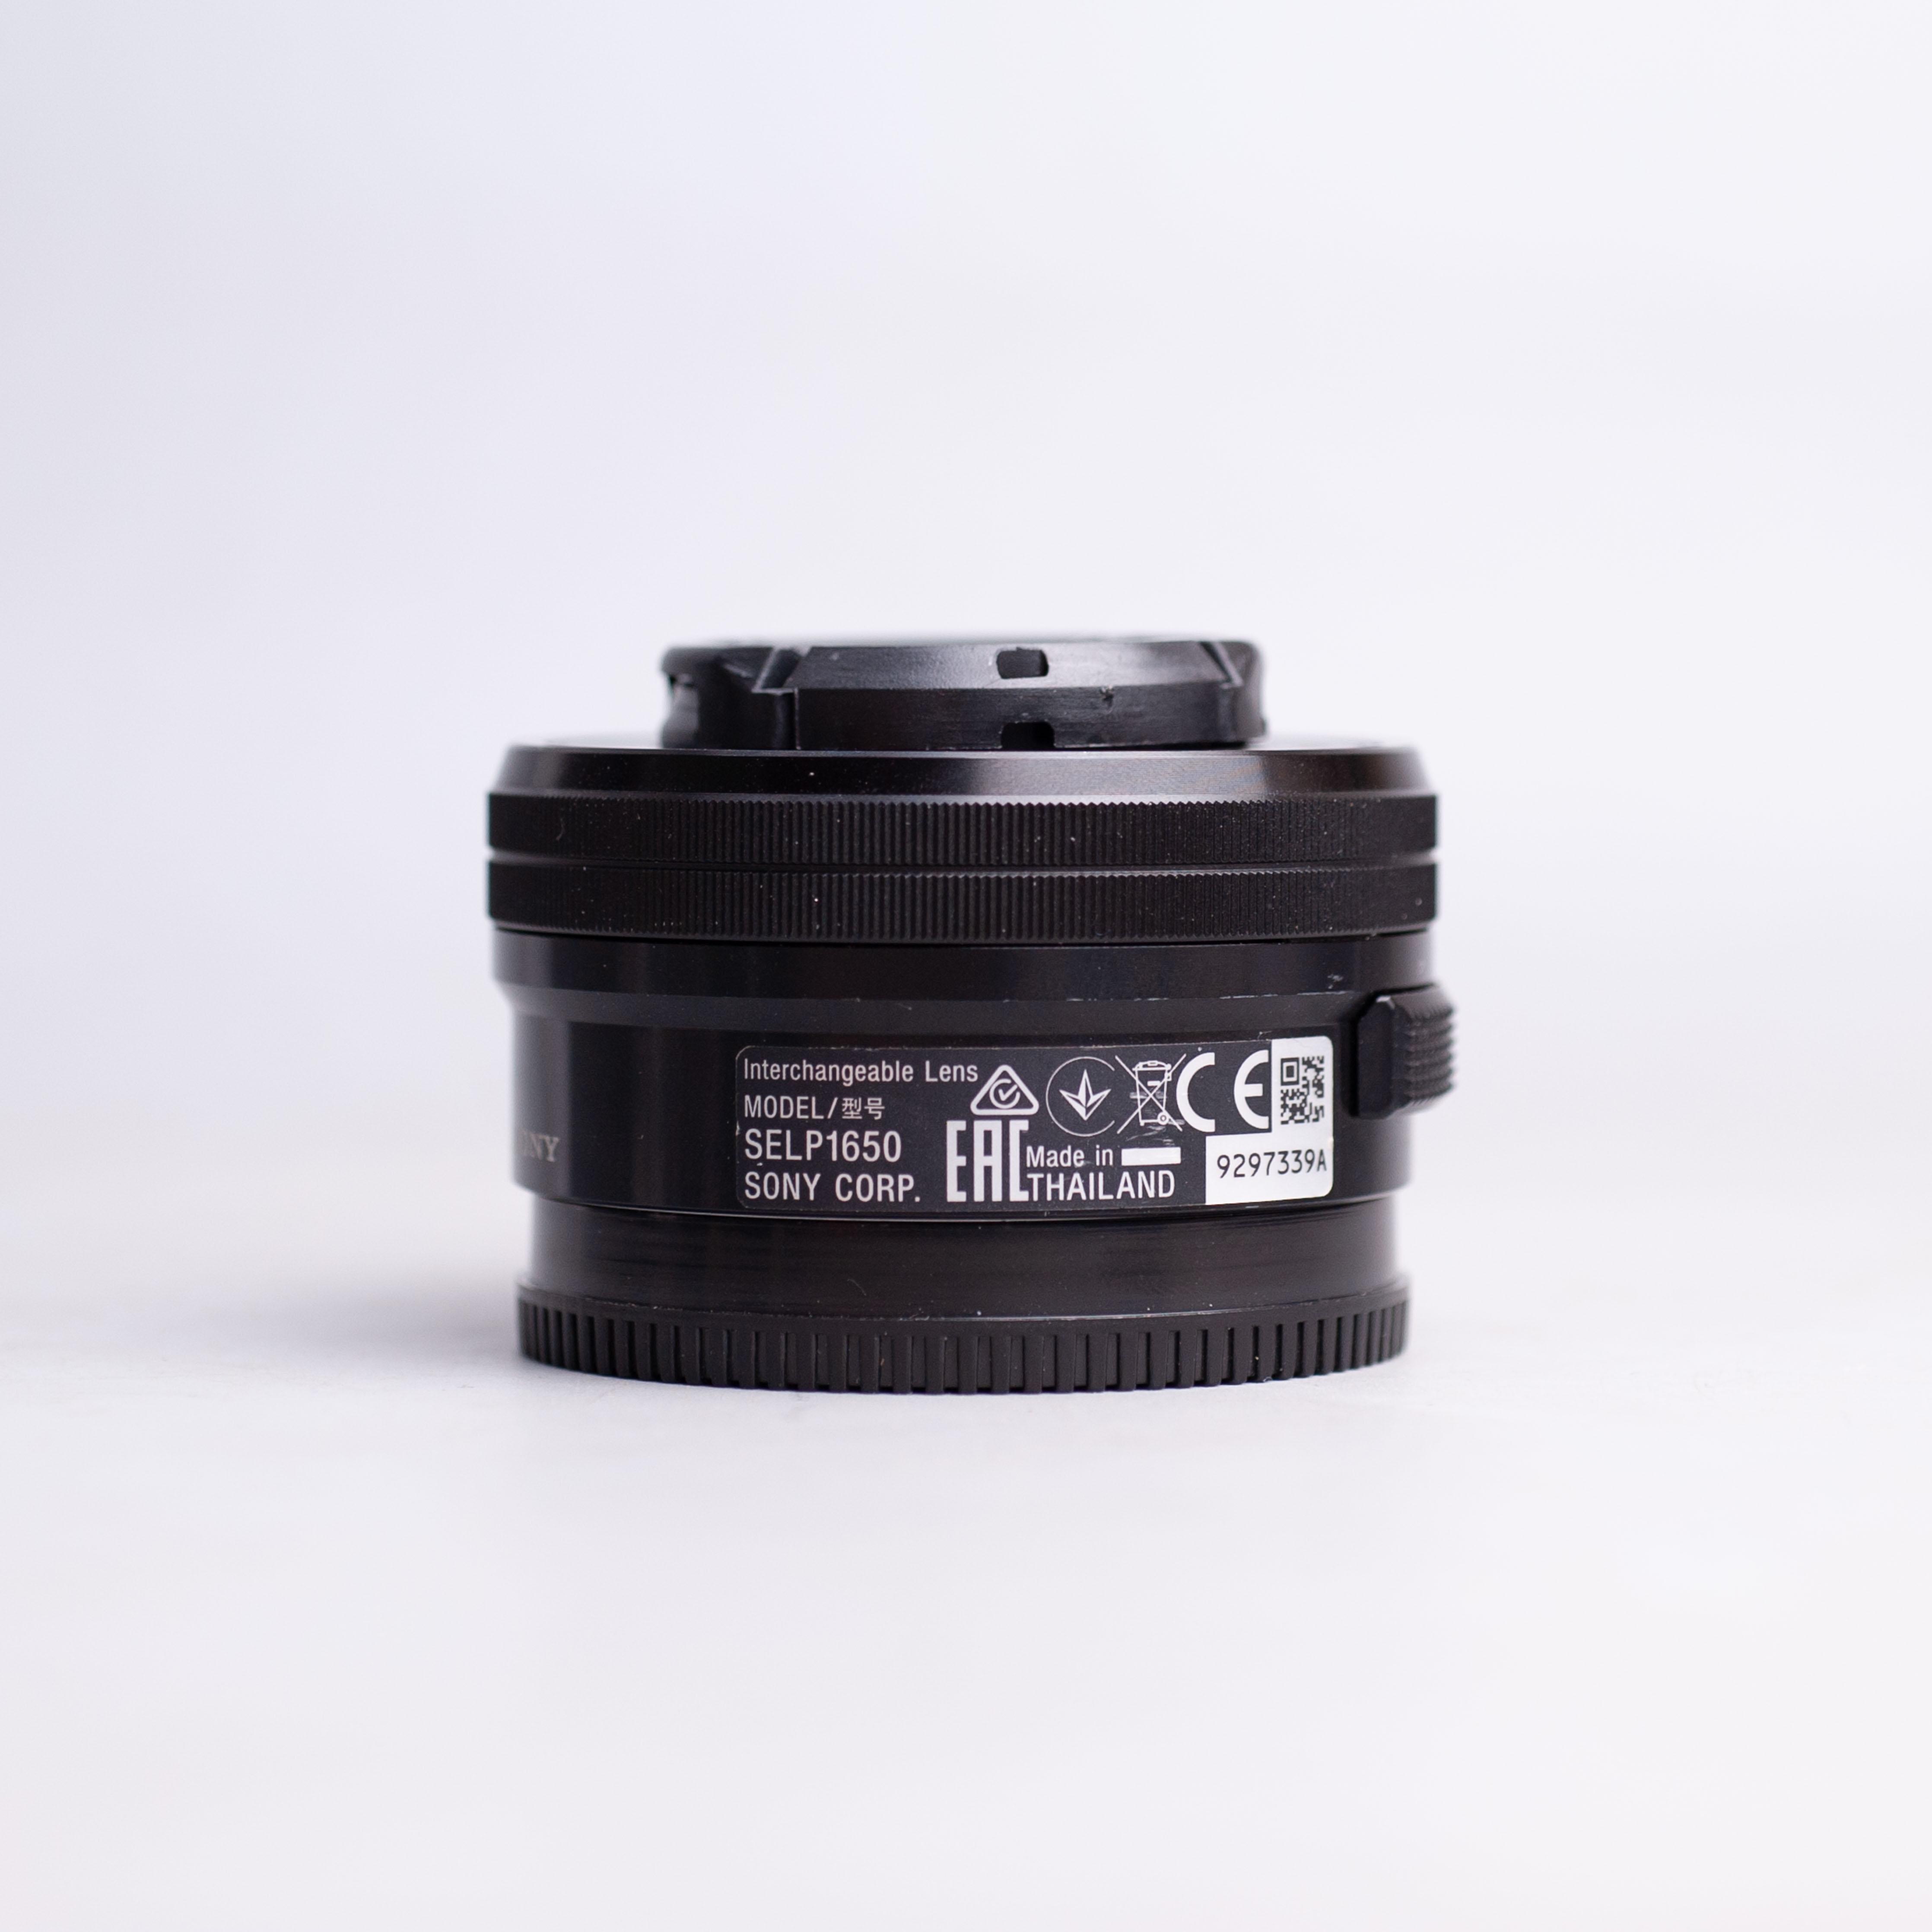 sony-16-50mm-f3-5-5-6-oss-af-sony-e-nex-16-50-3-5-5-6-18604